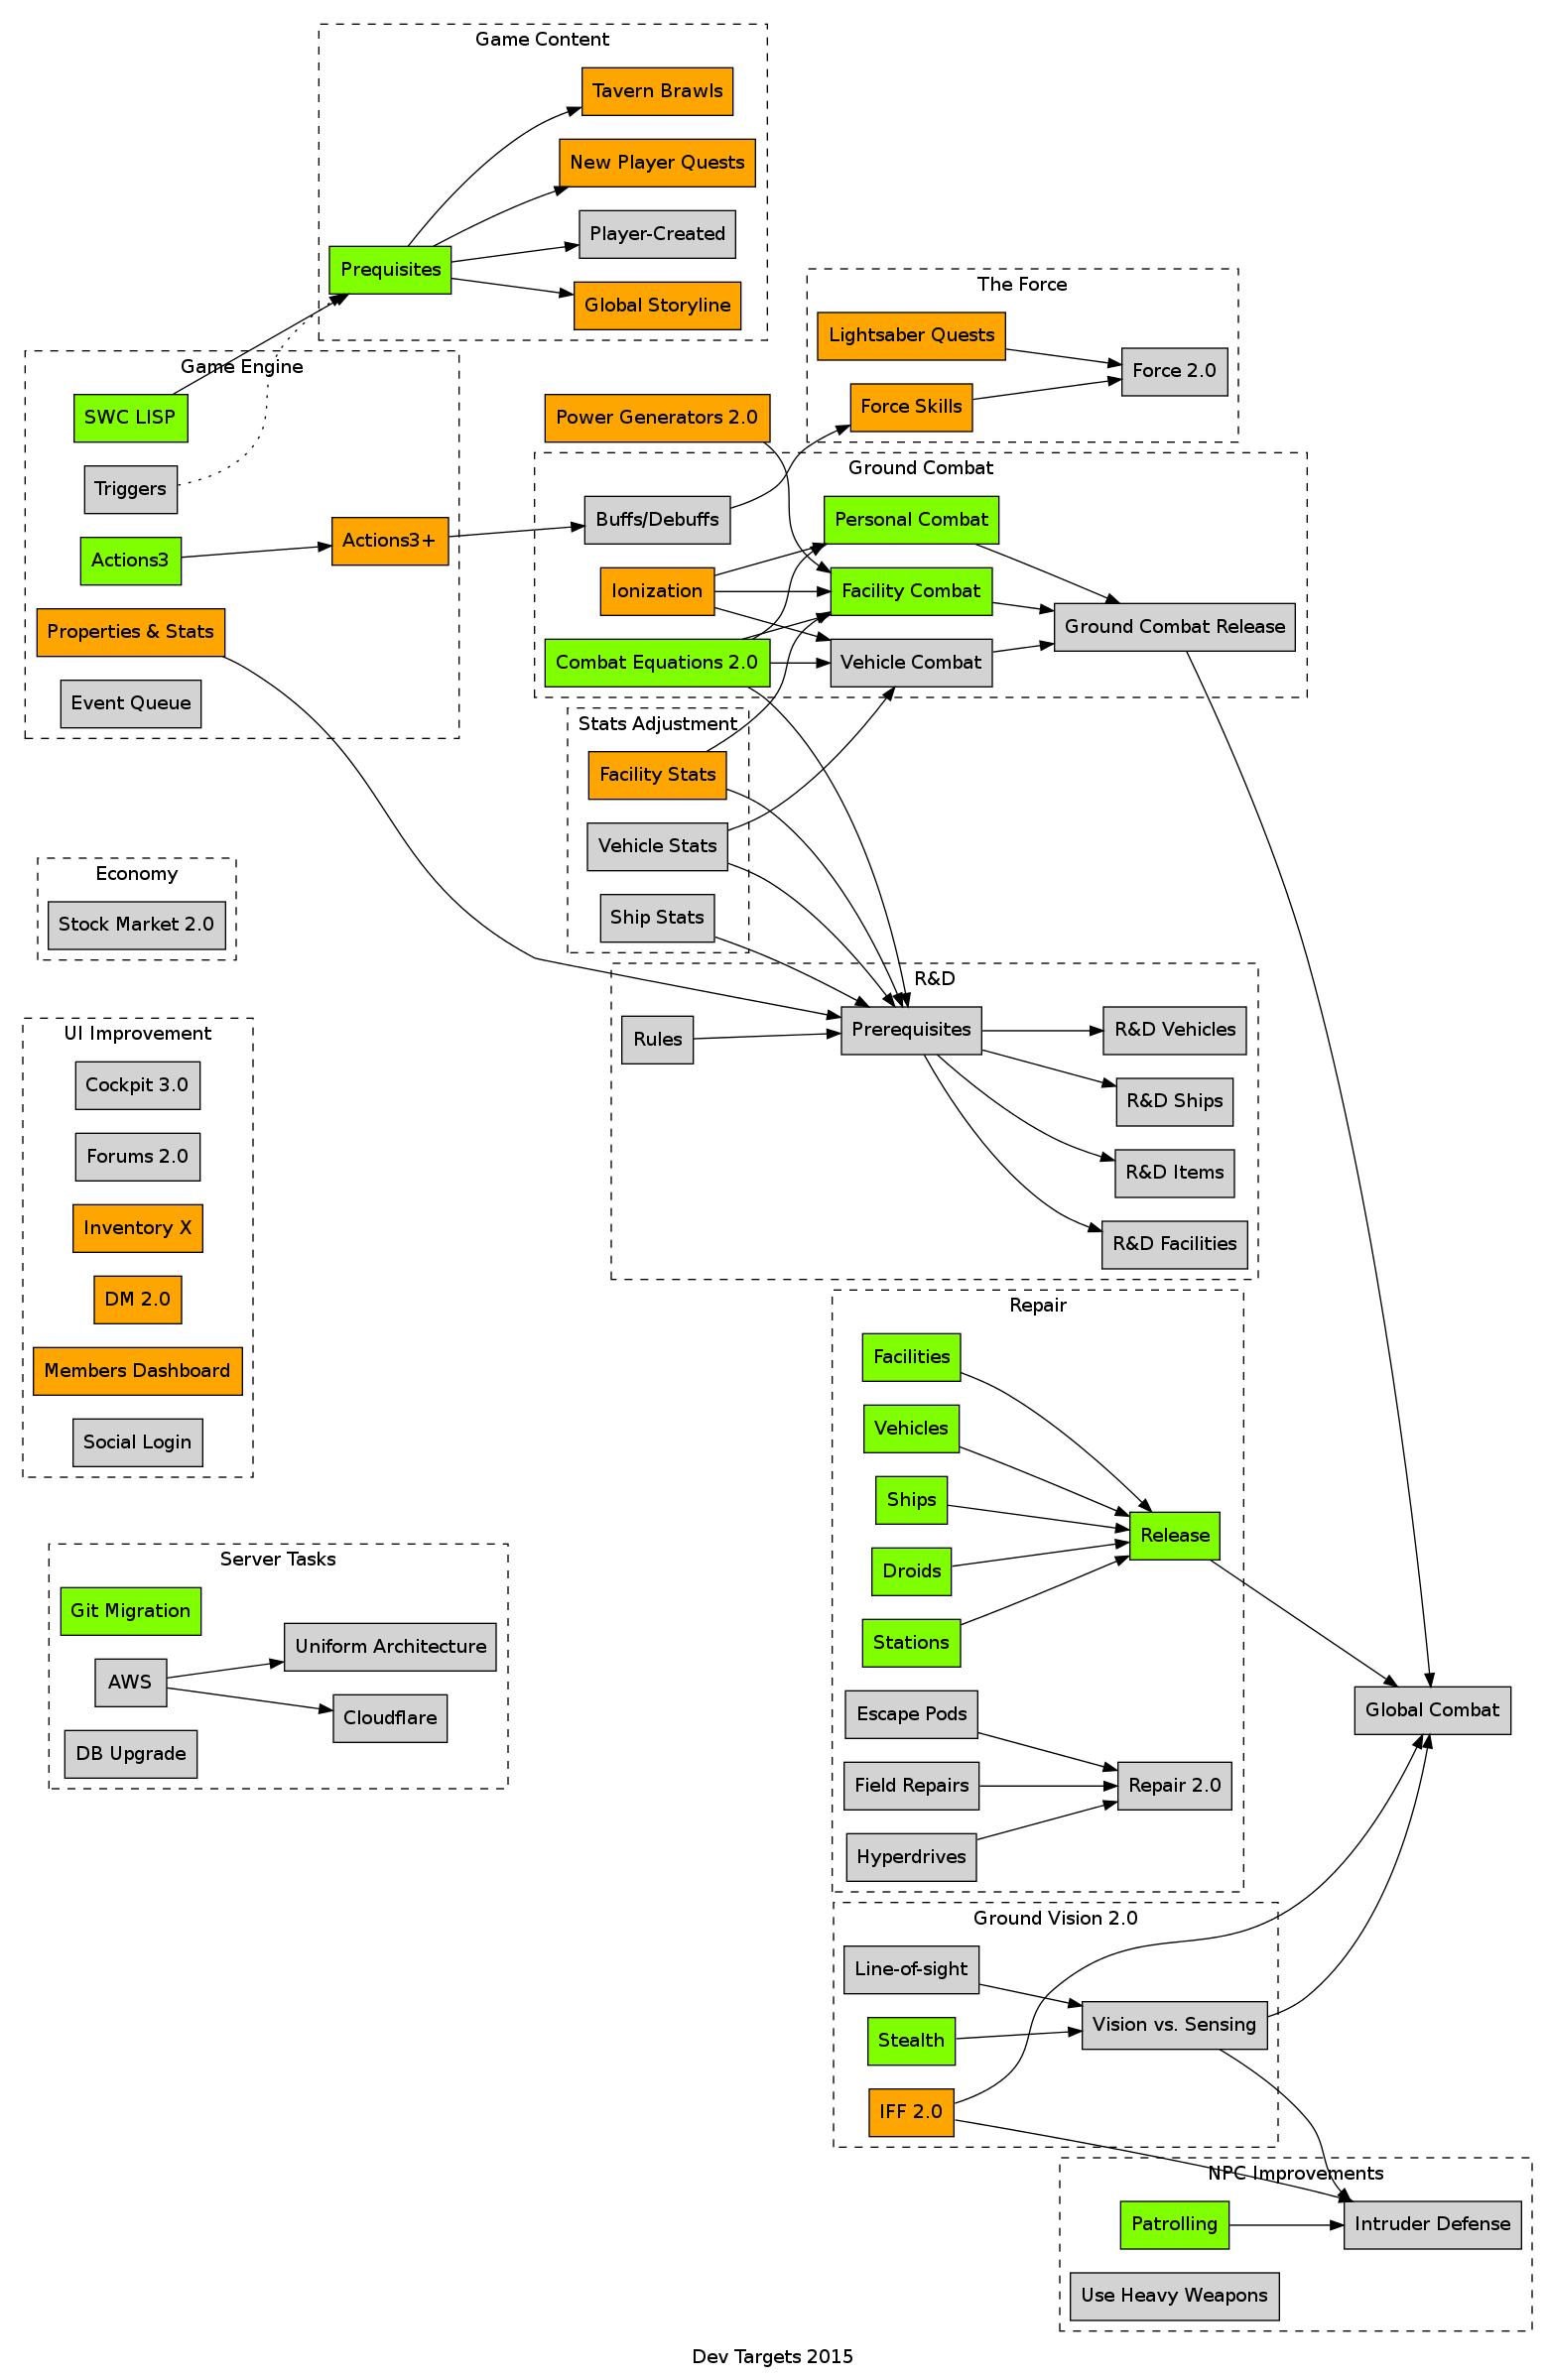 Dev Targets 2015 Q2 Flowchart